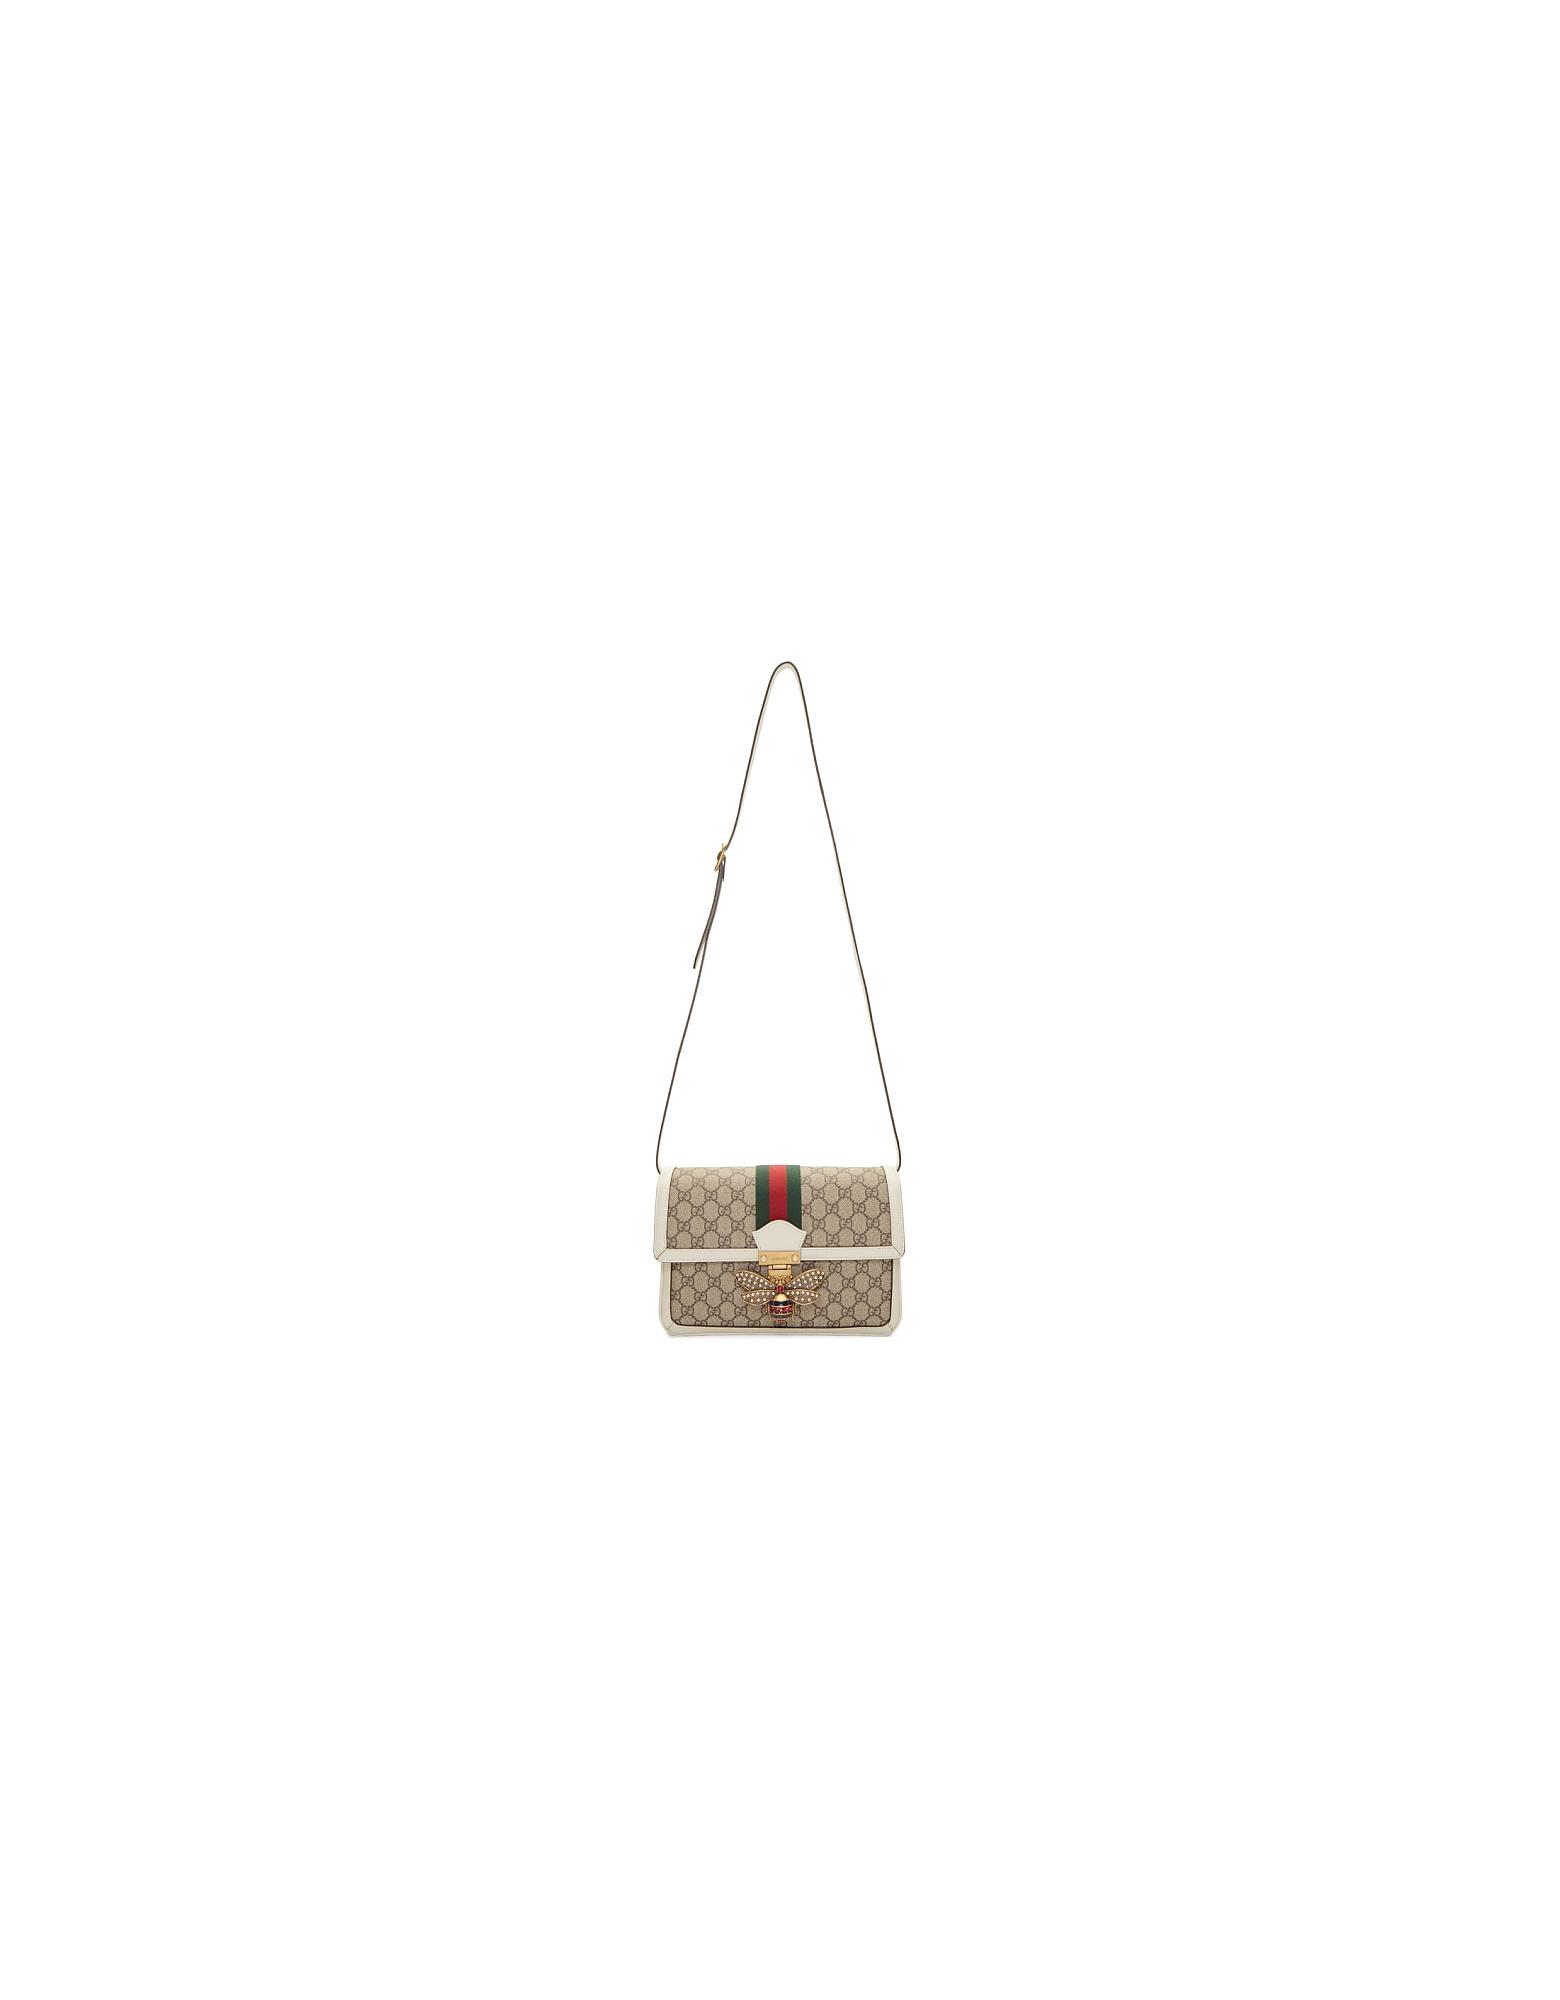 Gucci Designer Handbags, Beige and White GG Queen Margaret Bag